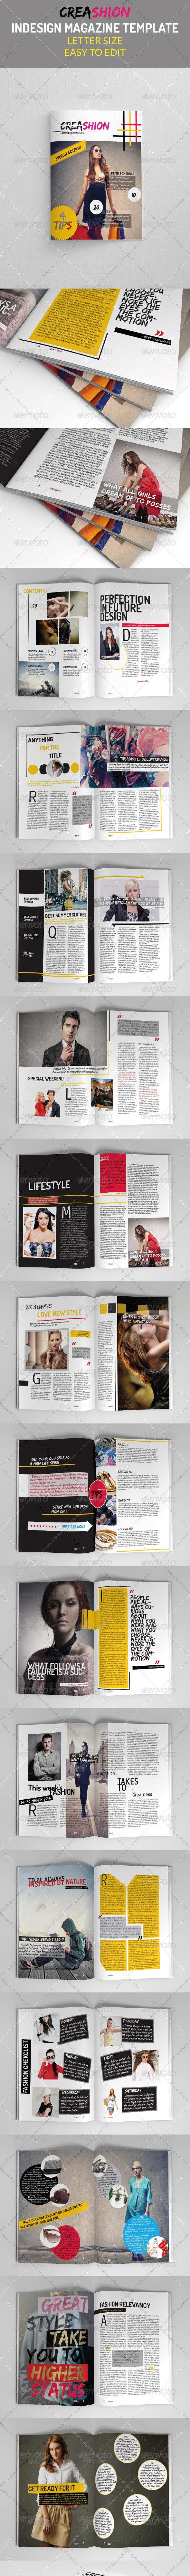 Creative Fashion Magazine - Magazines Print Templates